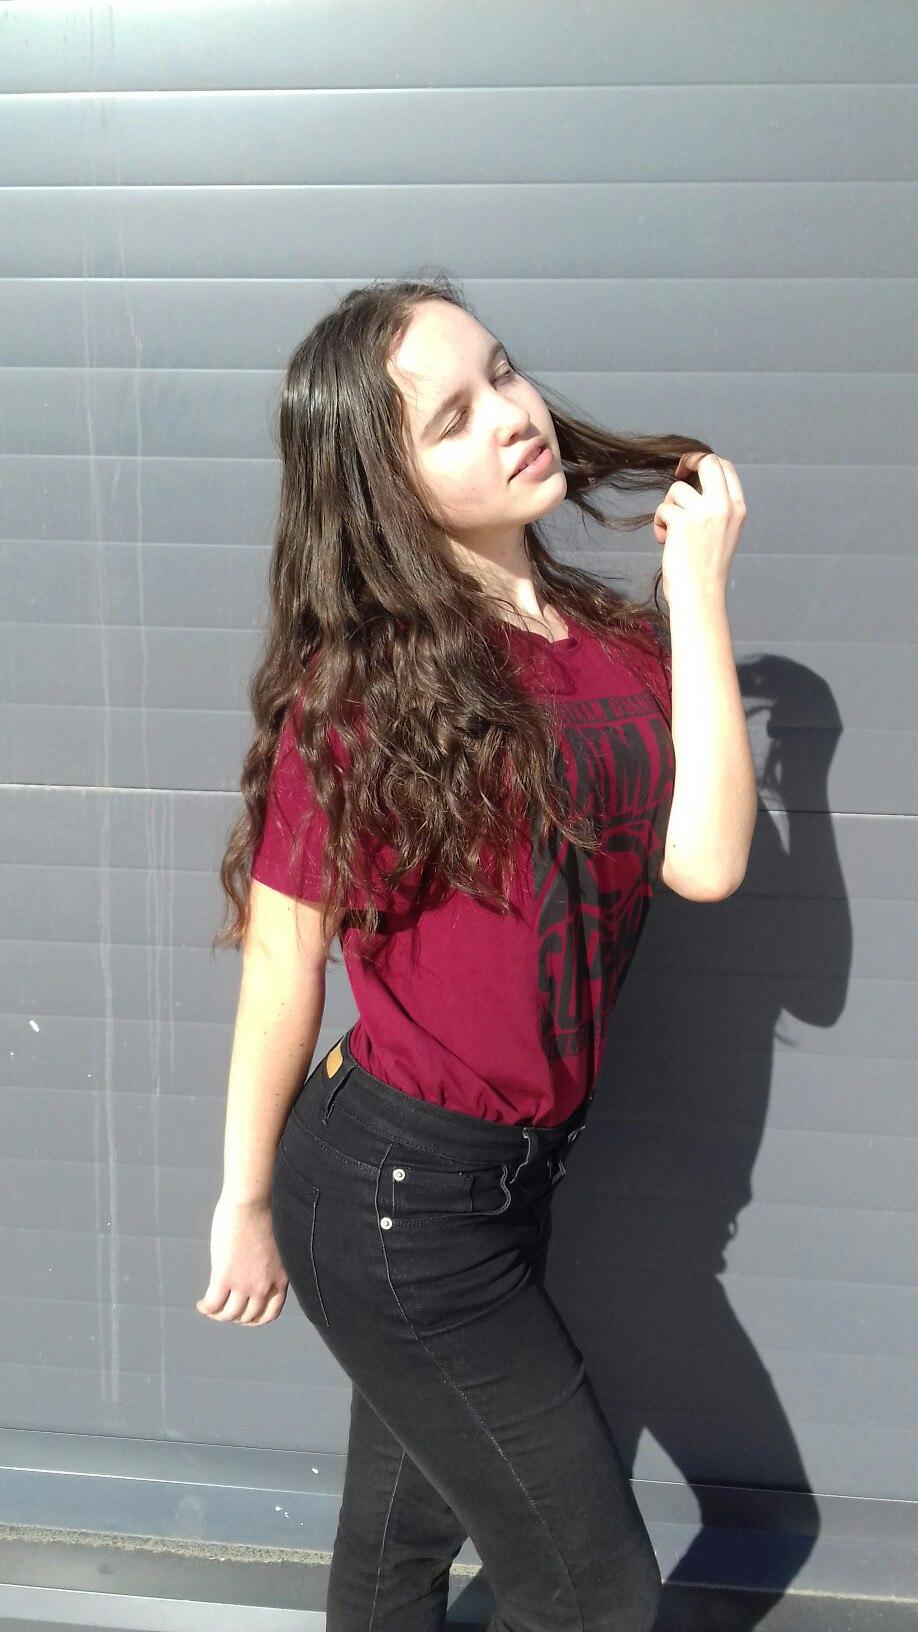 Репетитор Наталия, 19 лет. Фото №2